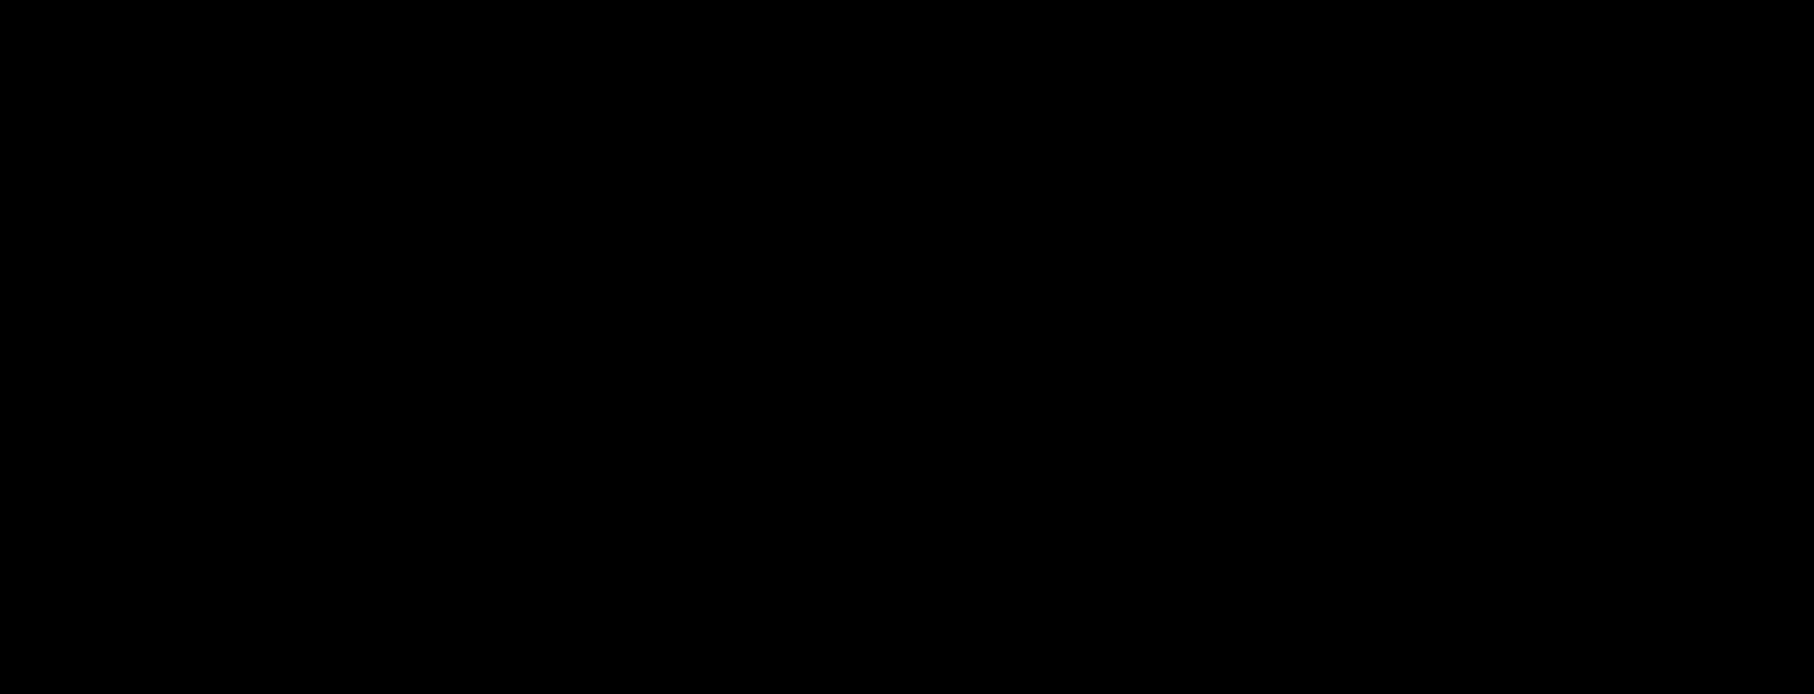 Dehydrozingerone 4-O-β-D-glucopyranoside